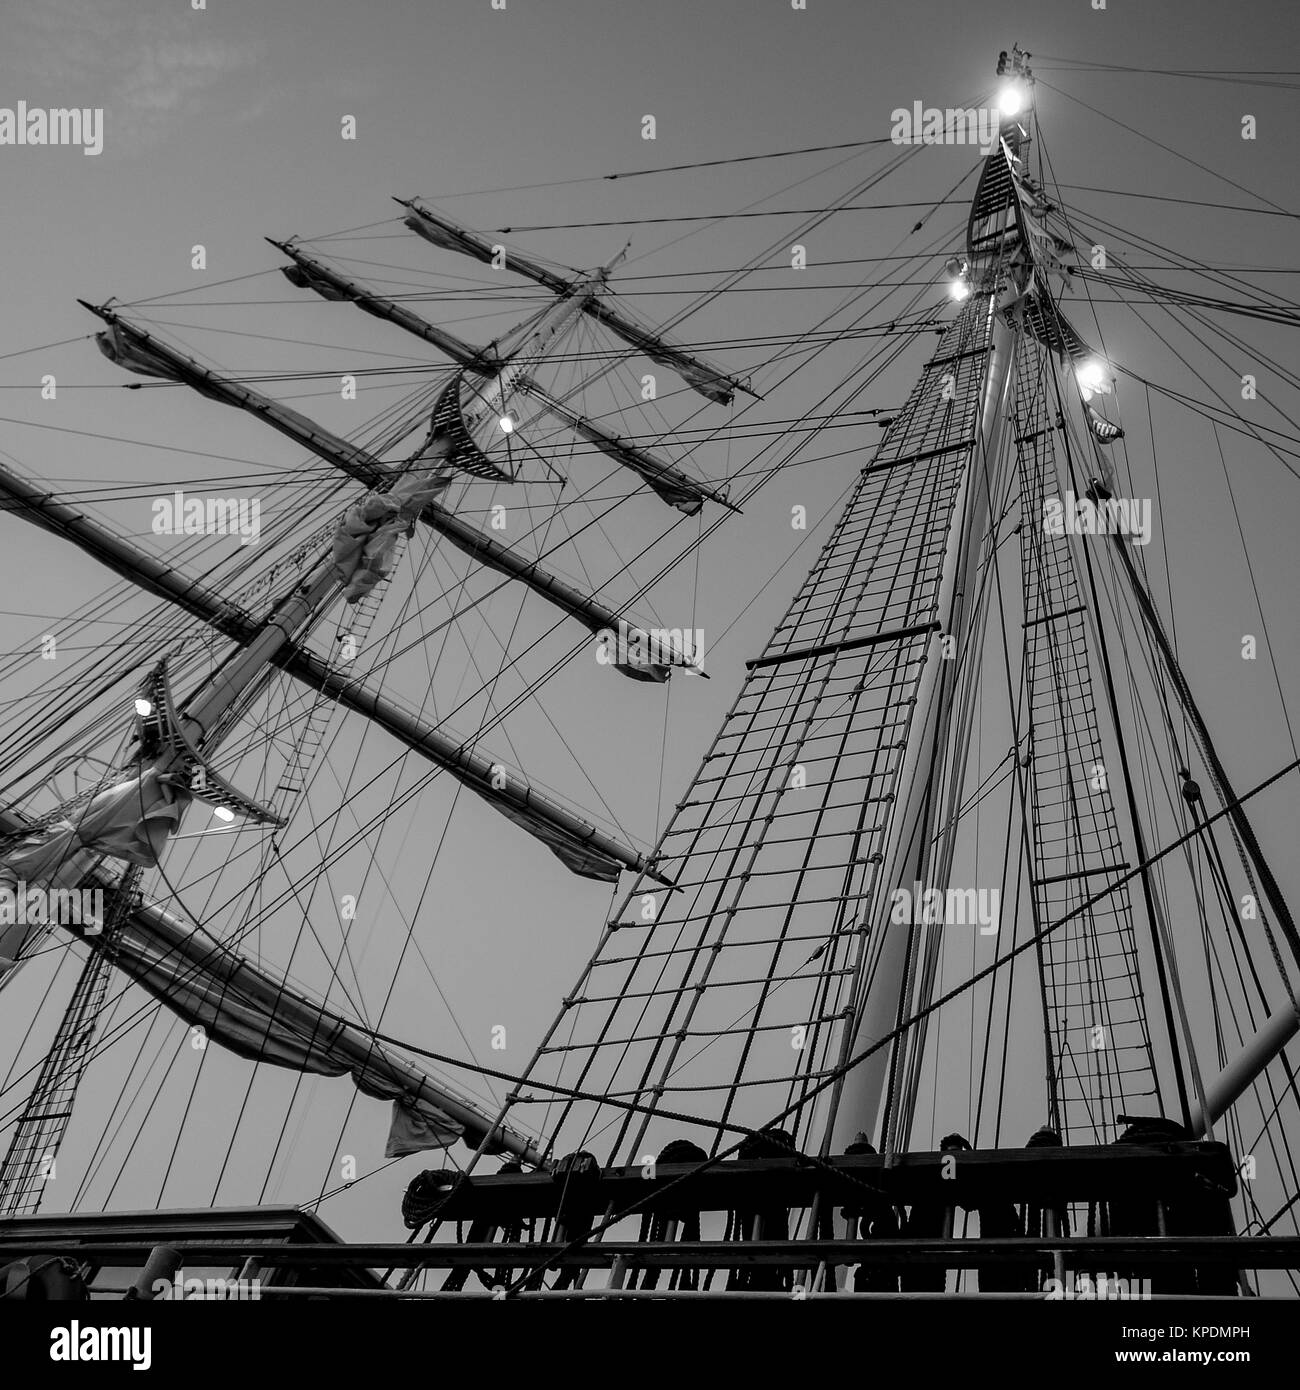 A two-masted sailing ship laying at quay in Olbia marina, Sardinia, Italy - Stock Image